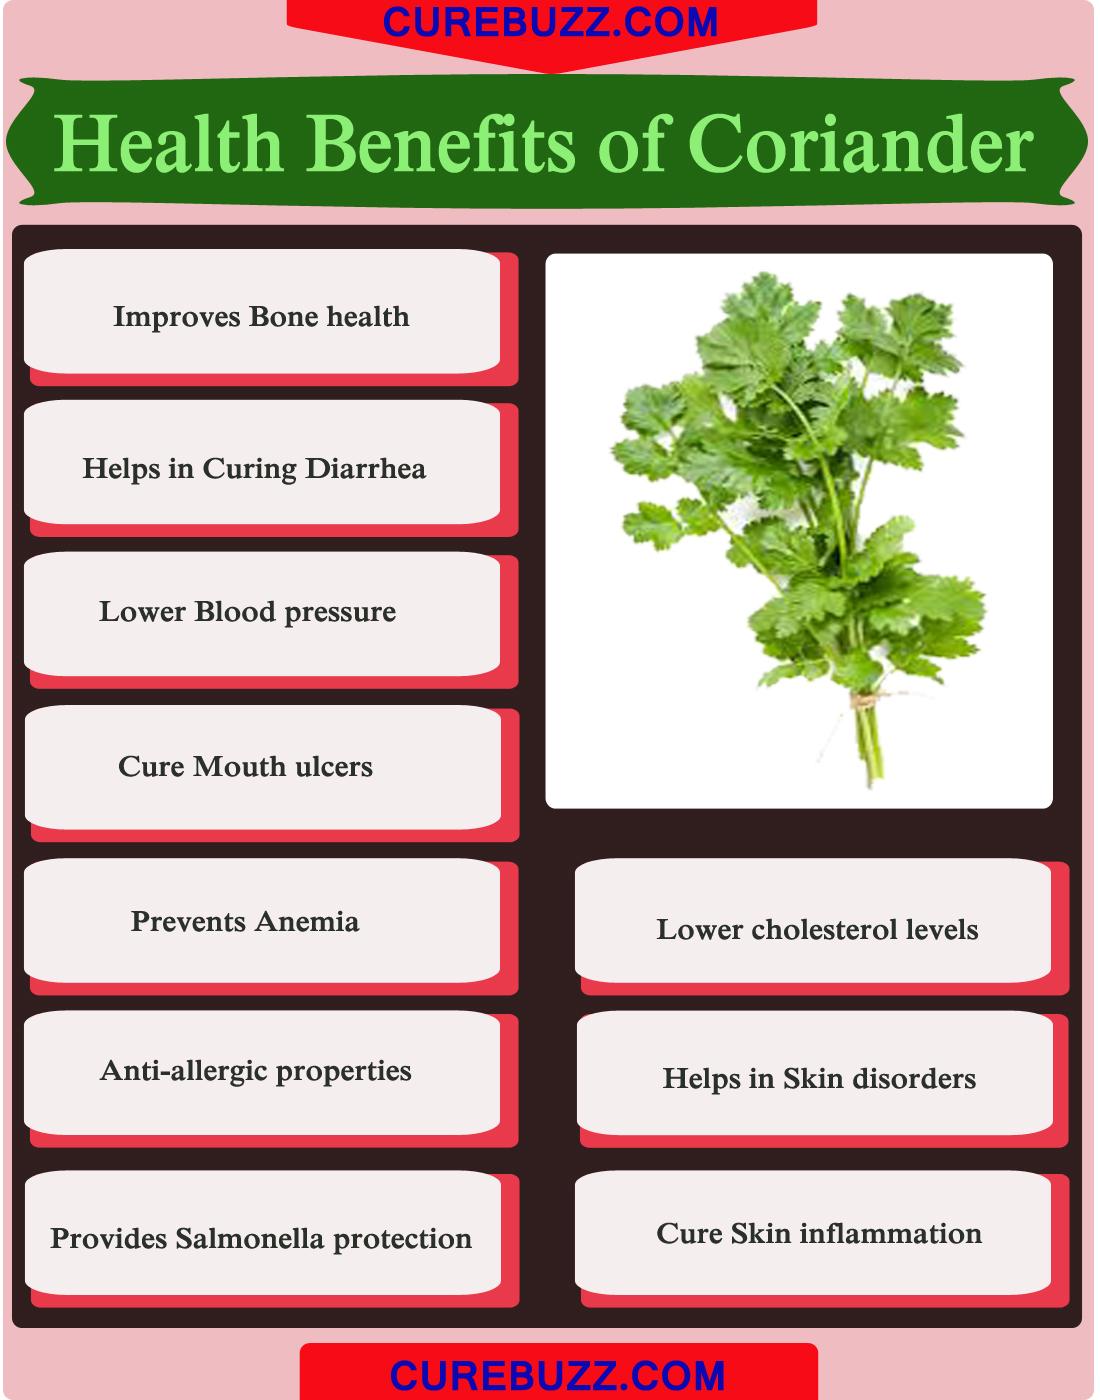 10 health benefits of coriander : getatoz